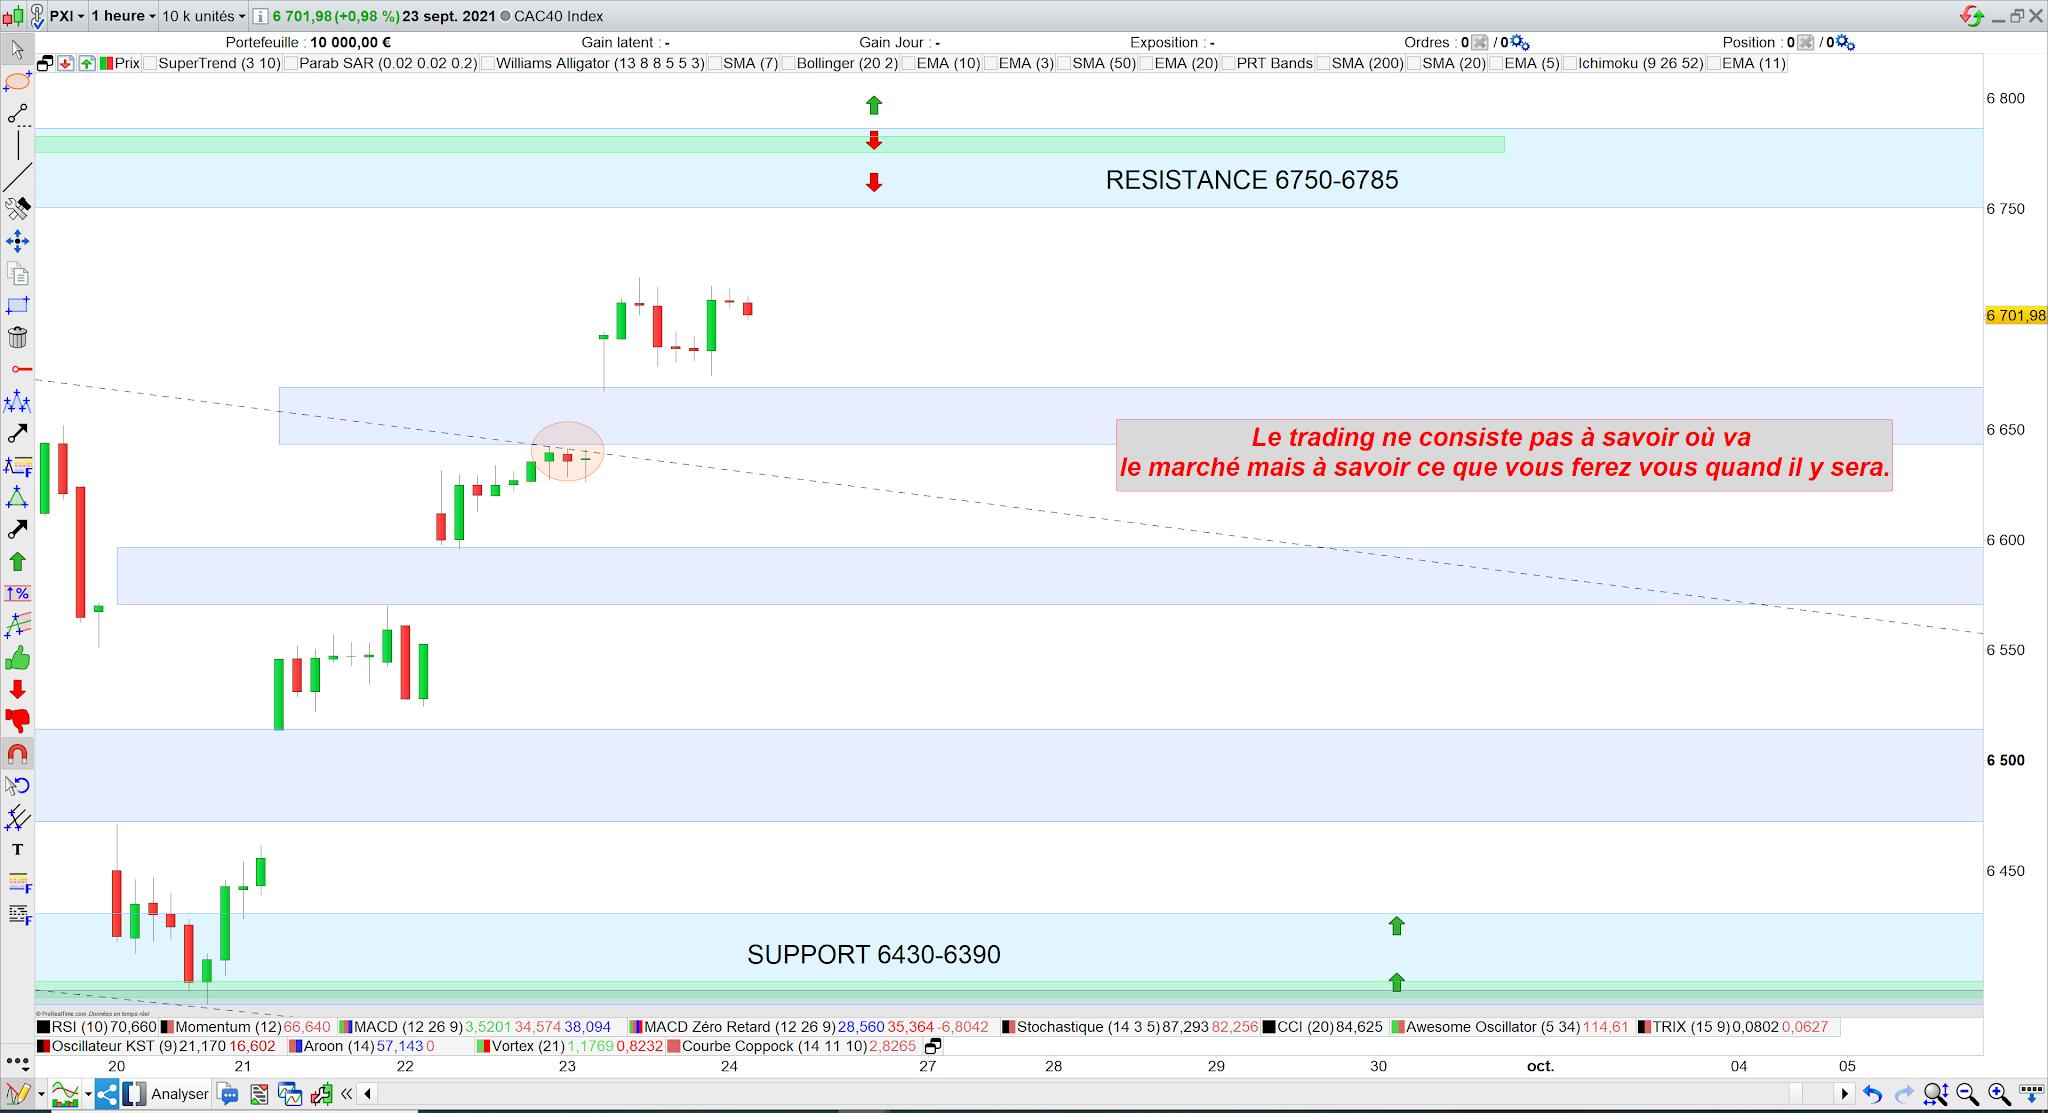 Trading cac40 bilan 23/09/21